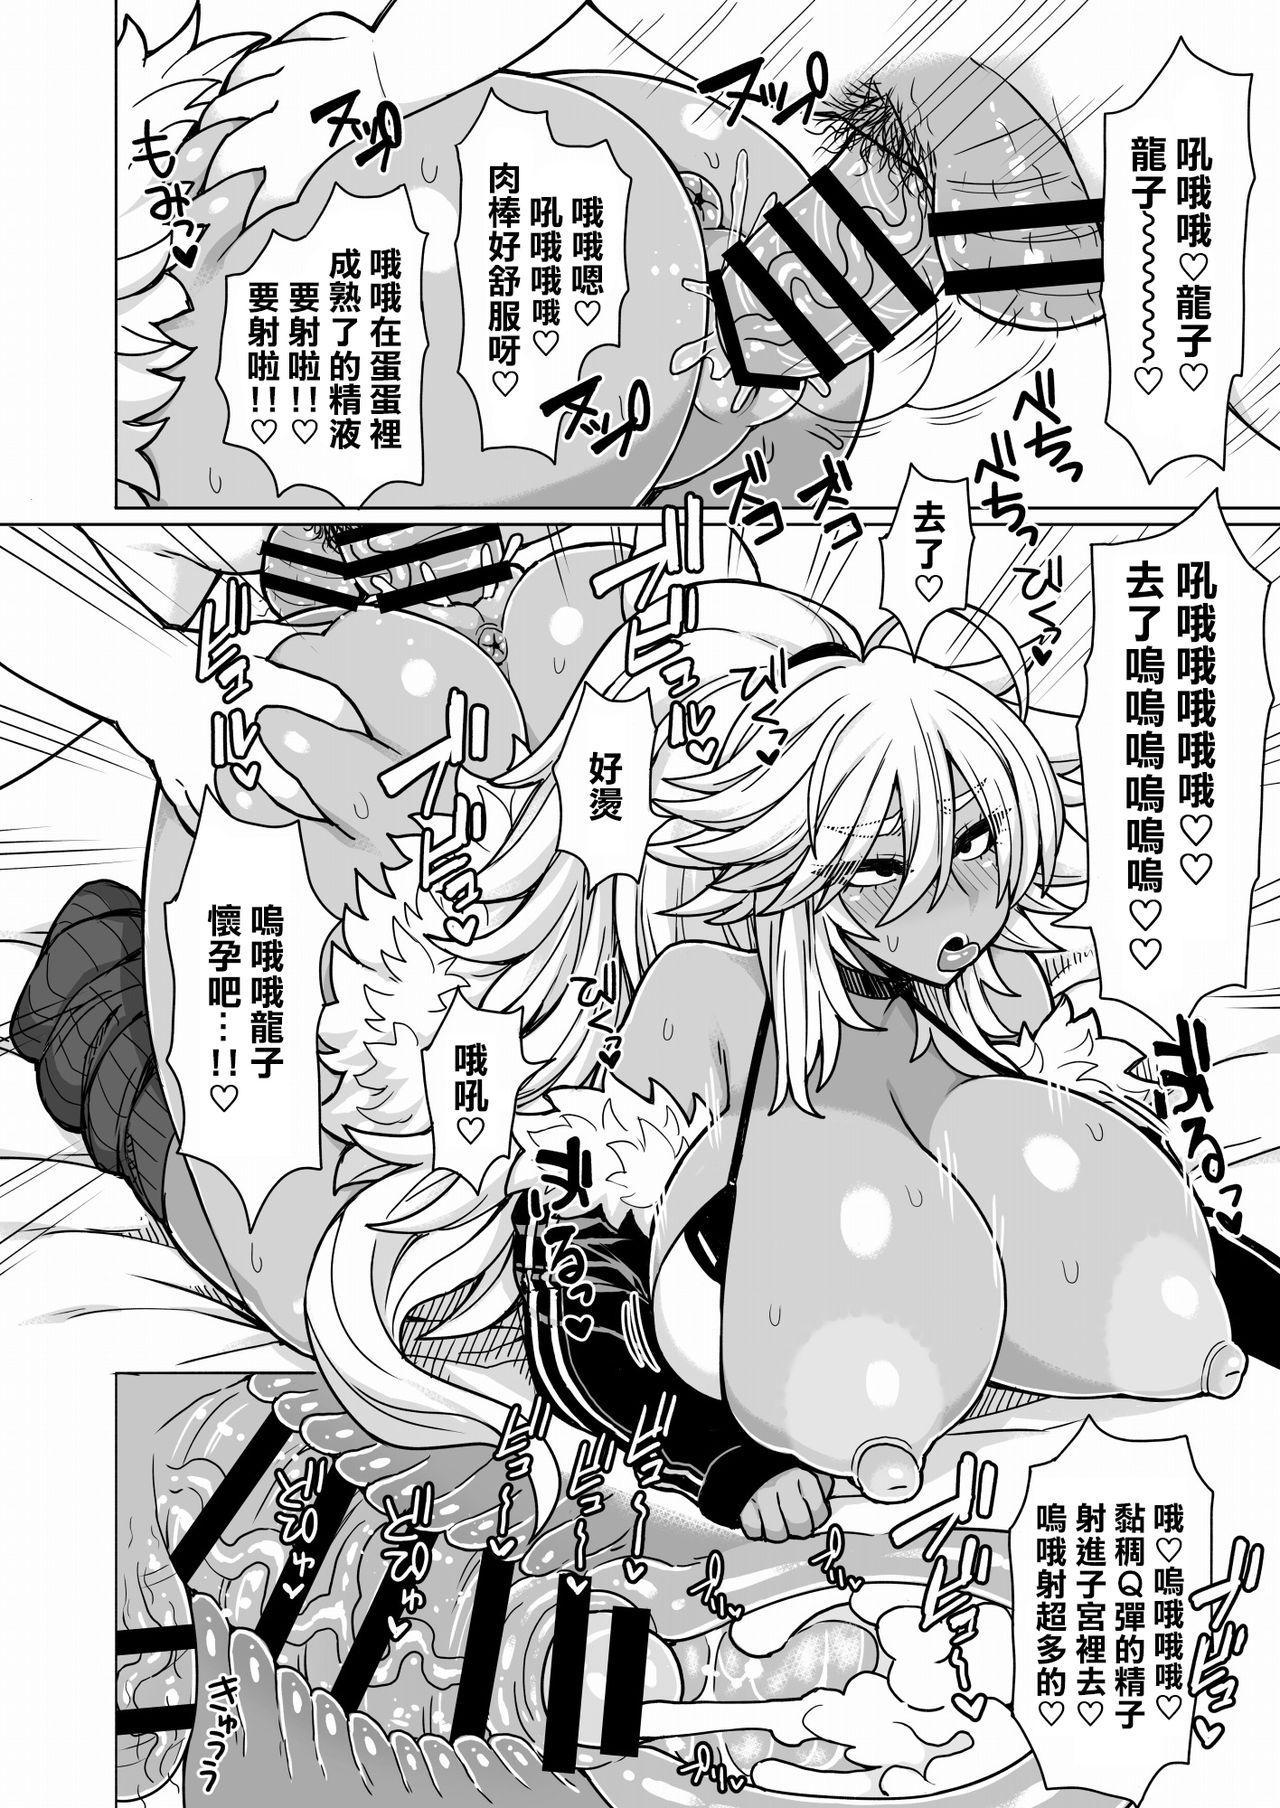 Futari no Kuro Gal Yankee | 兩個不良黑皮辣妹 20